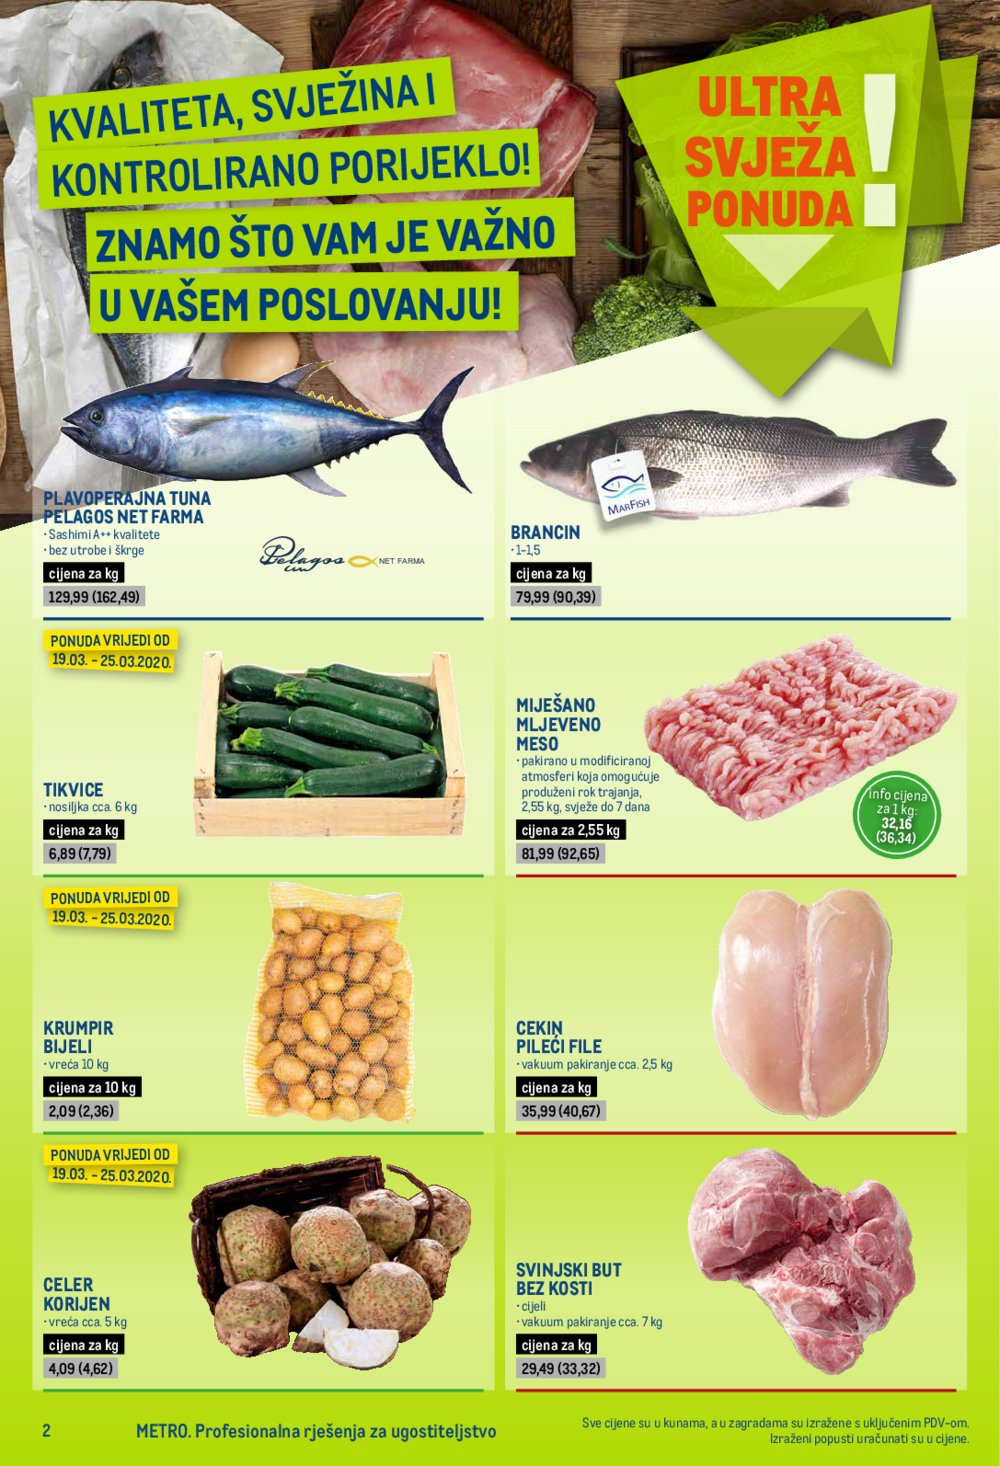 Metro katalog Posebna ponuda za ugostitelje 19.03.-01.04.2020.